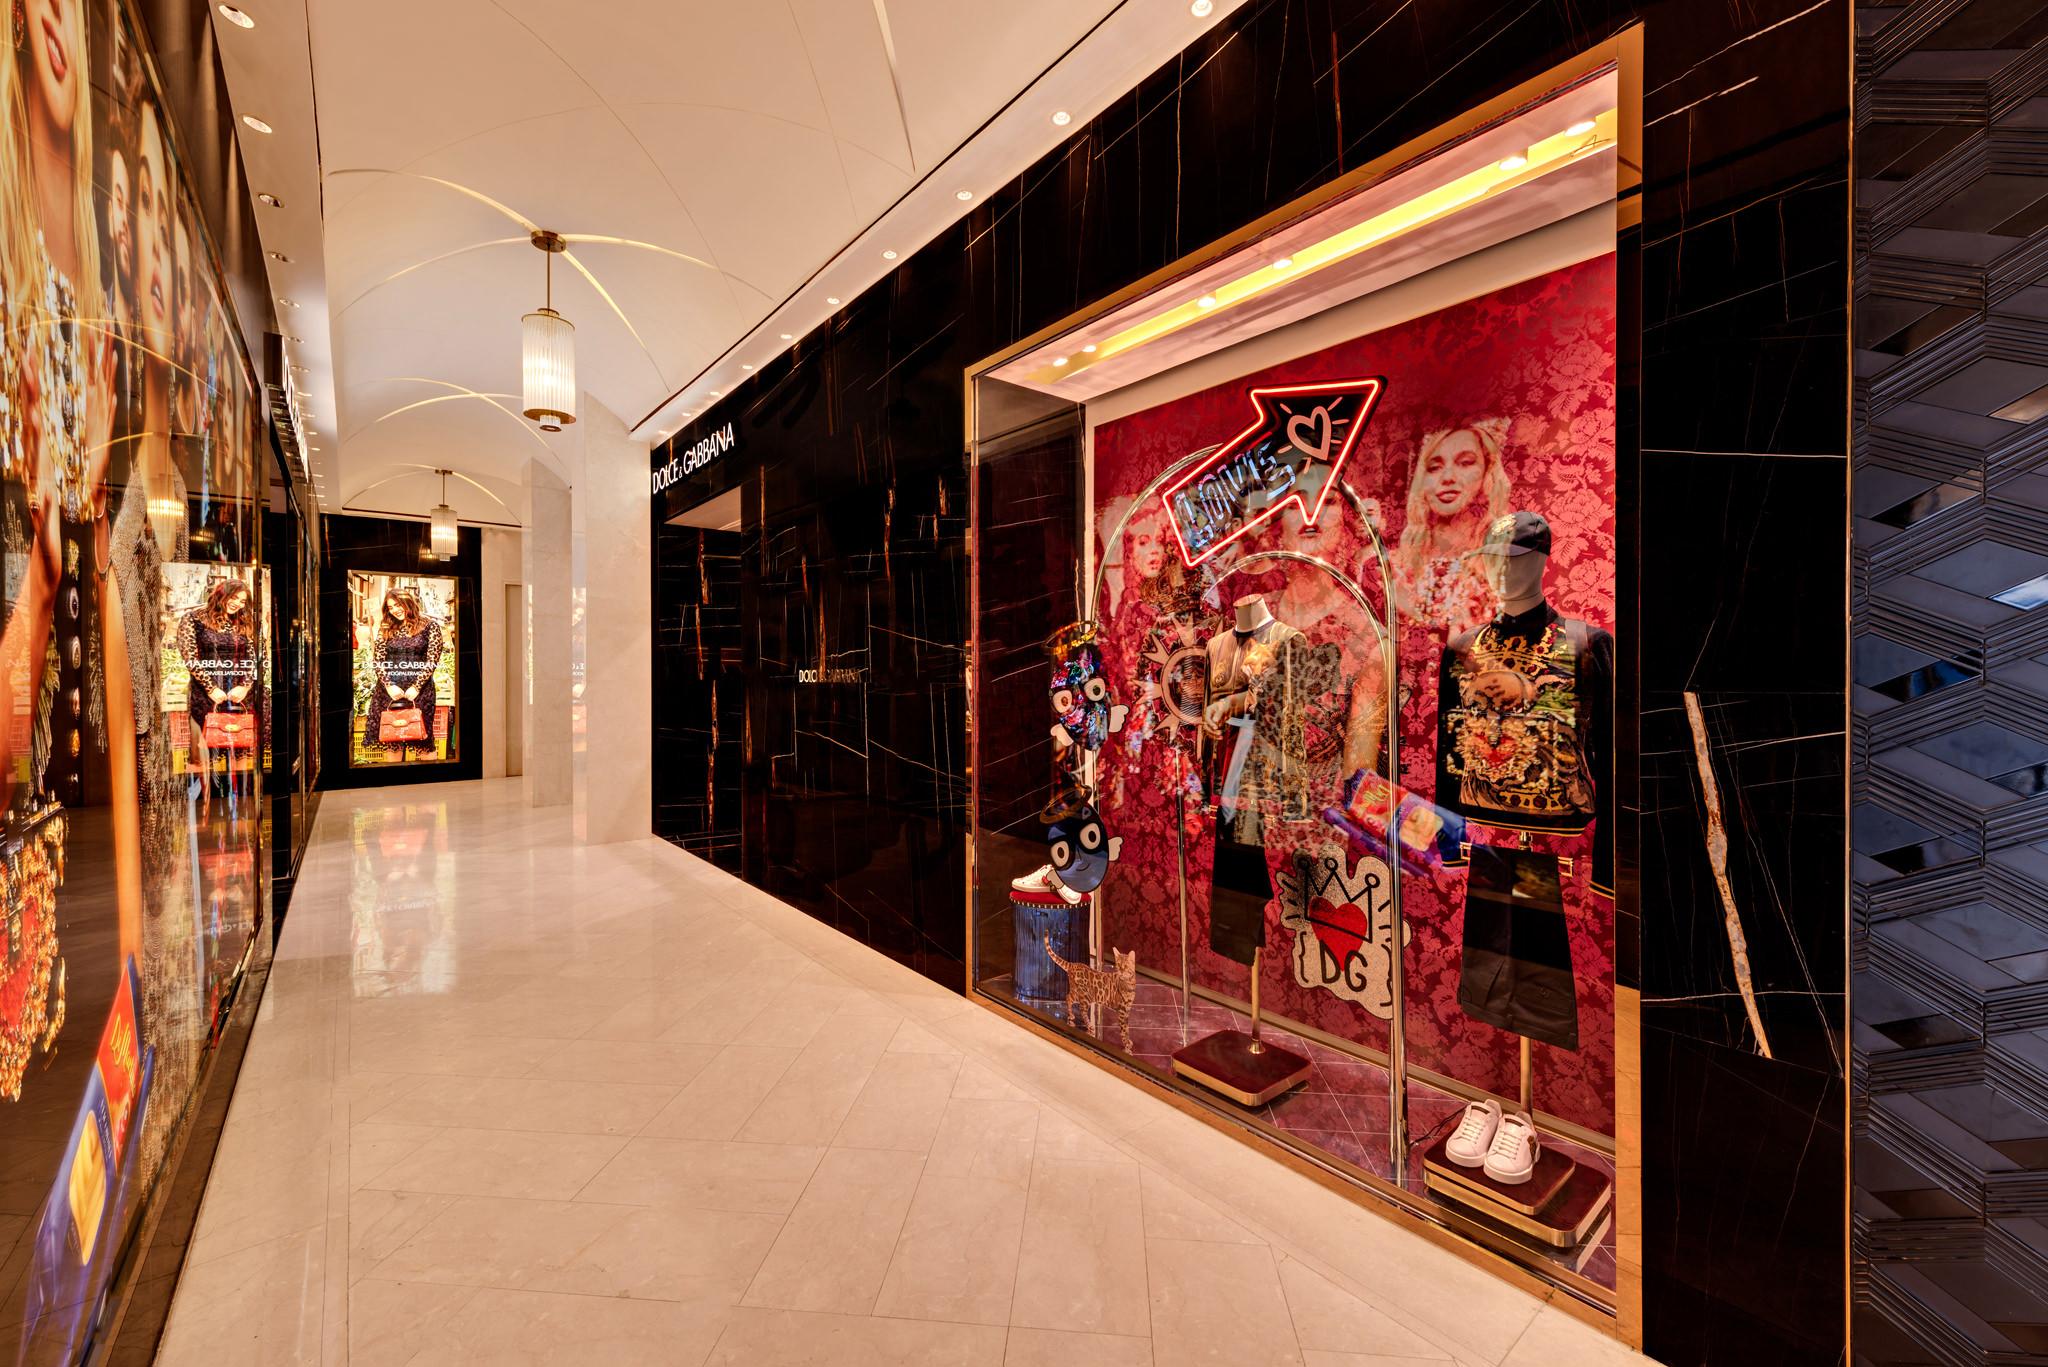 20171011 - Dolce & Gabbana - HCM - Commercial - Interior - Store - Retouch 0217.jpg